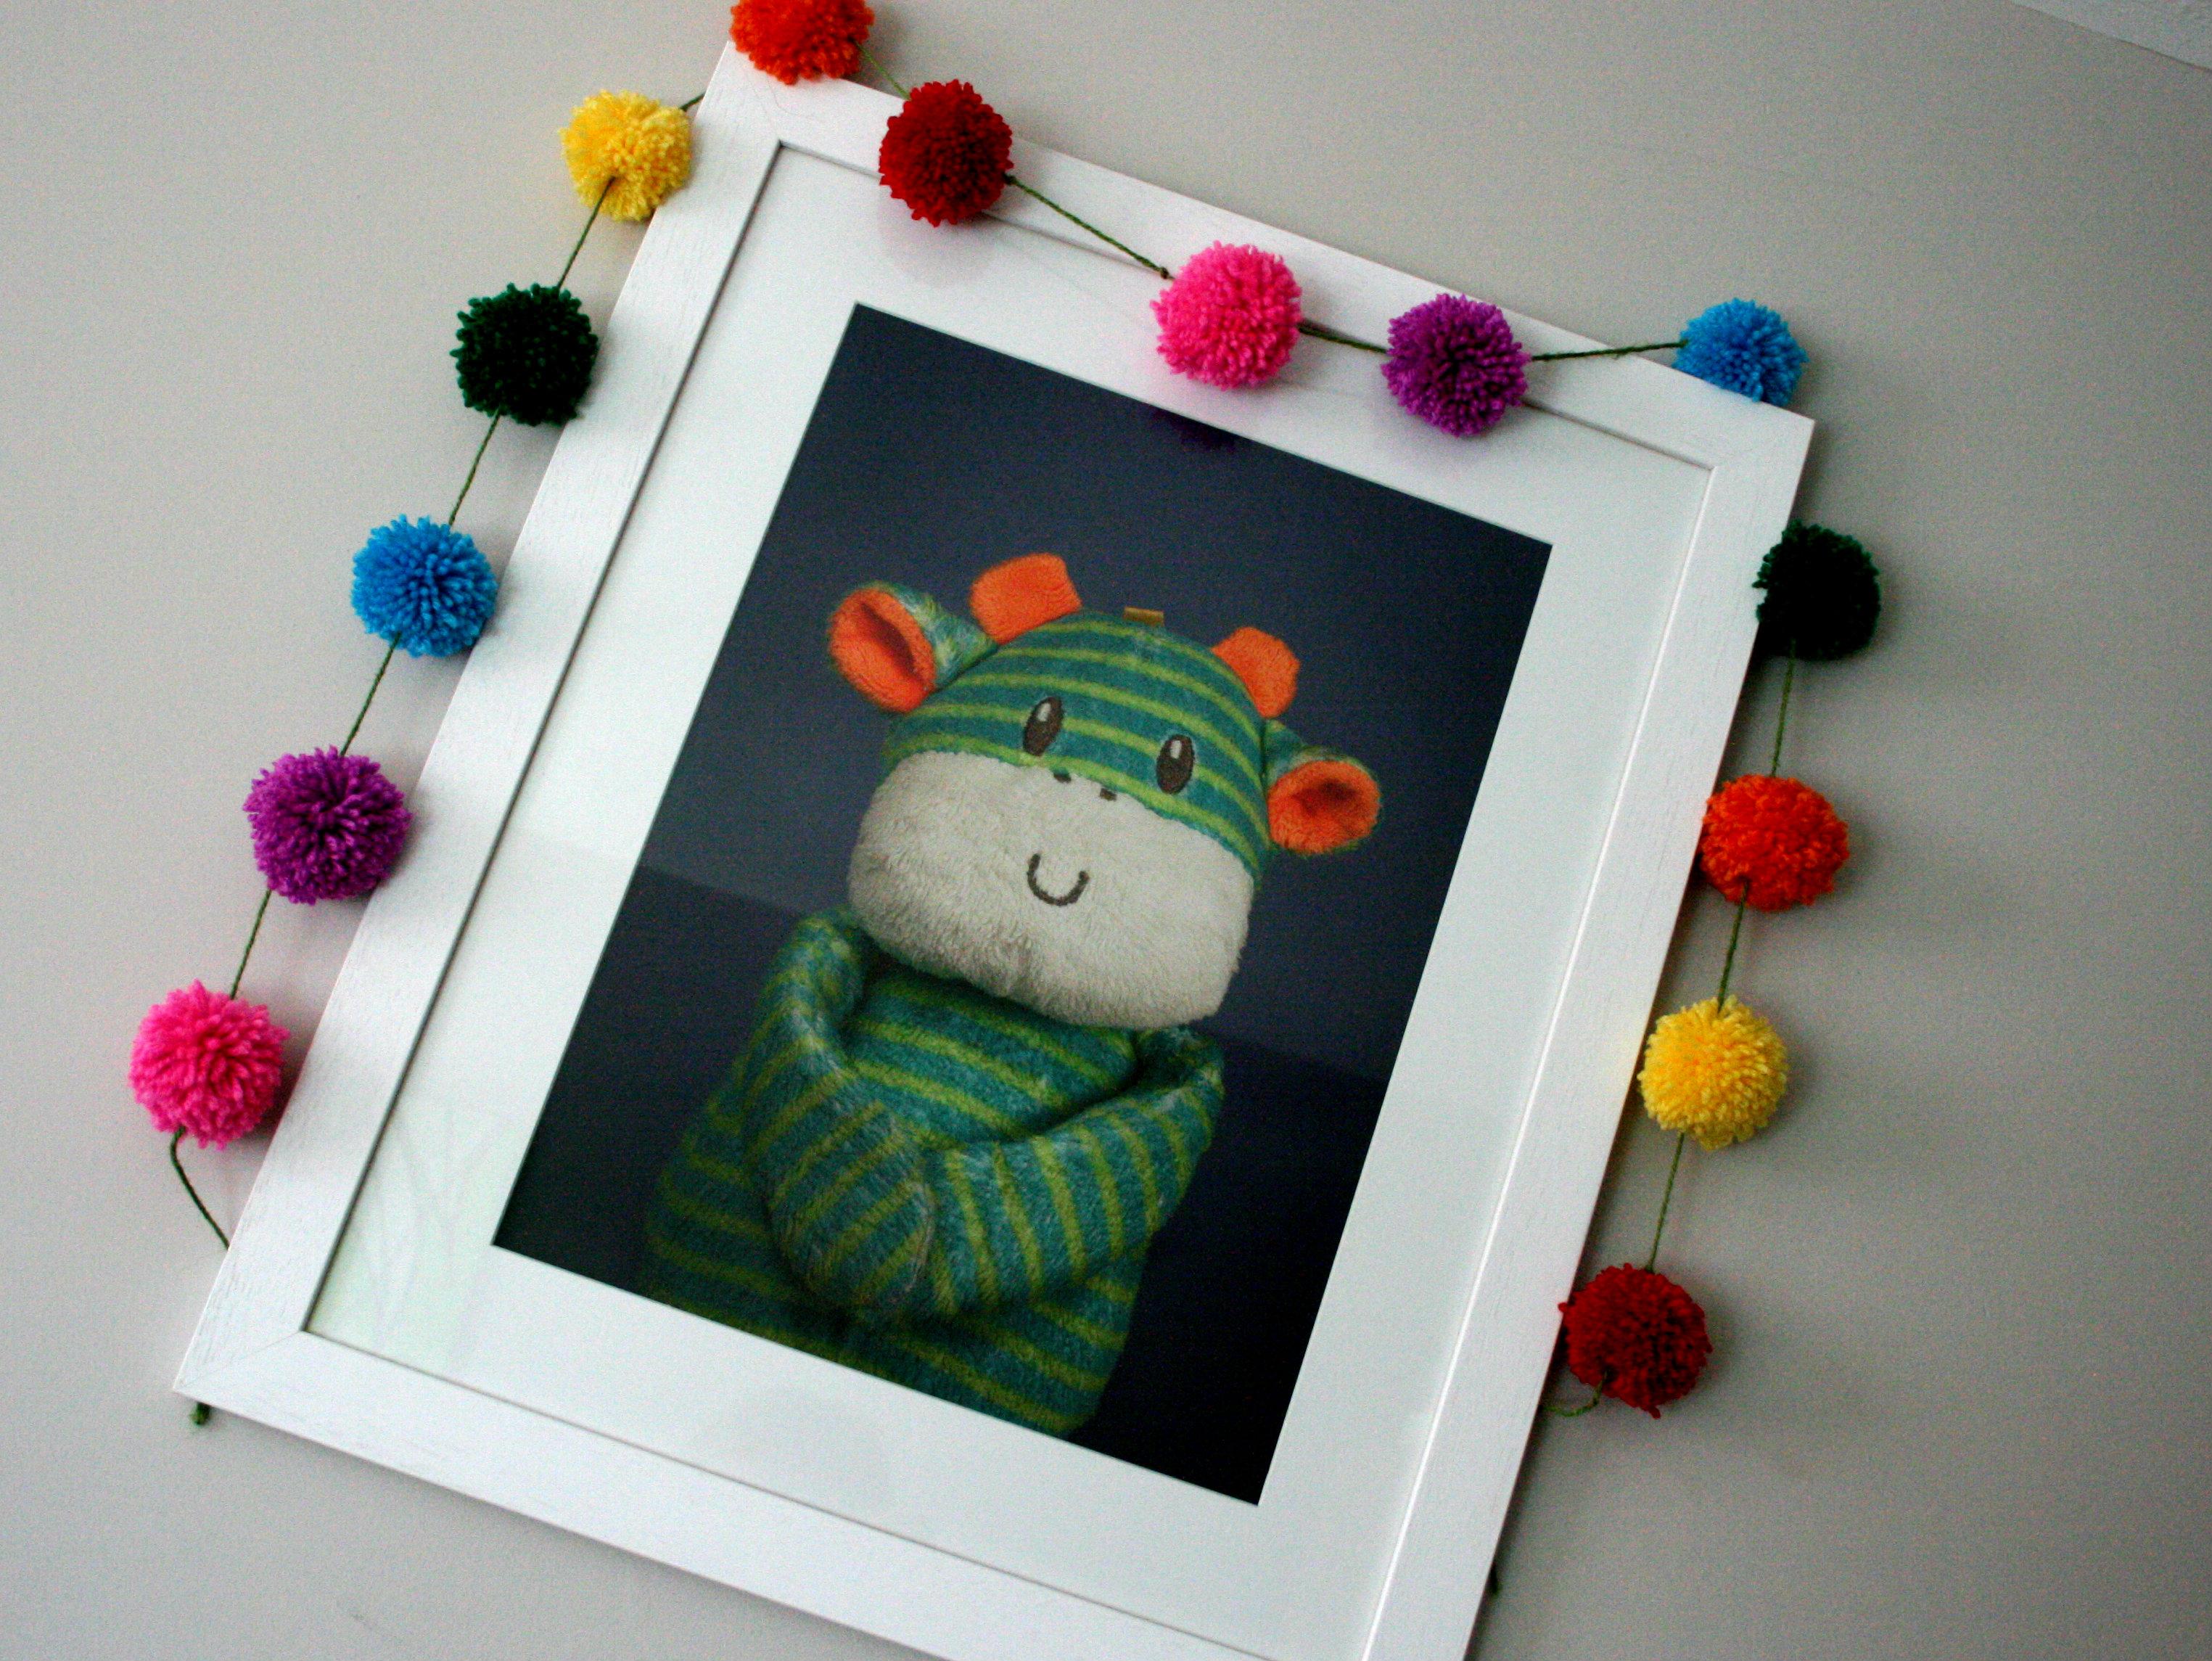 My Oldest Friend framed teddy portrait